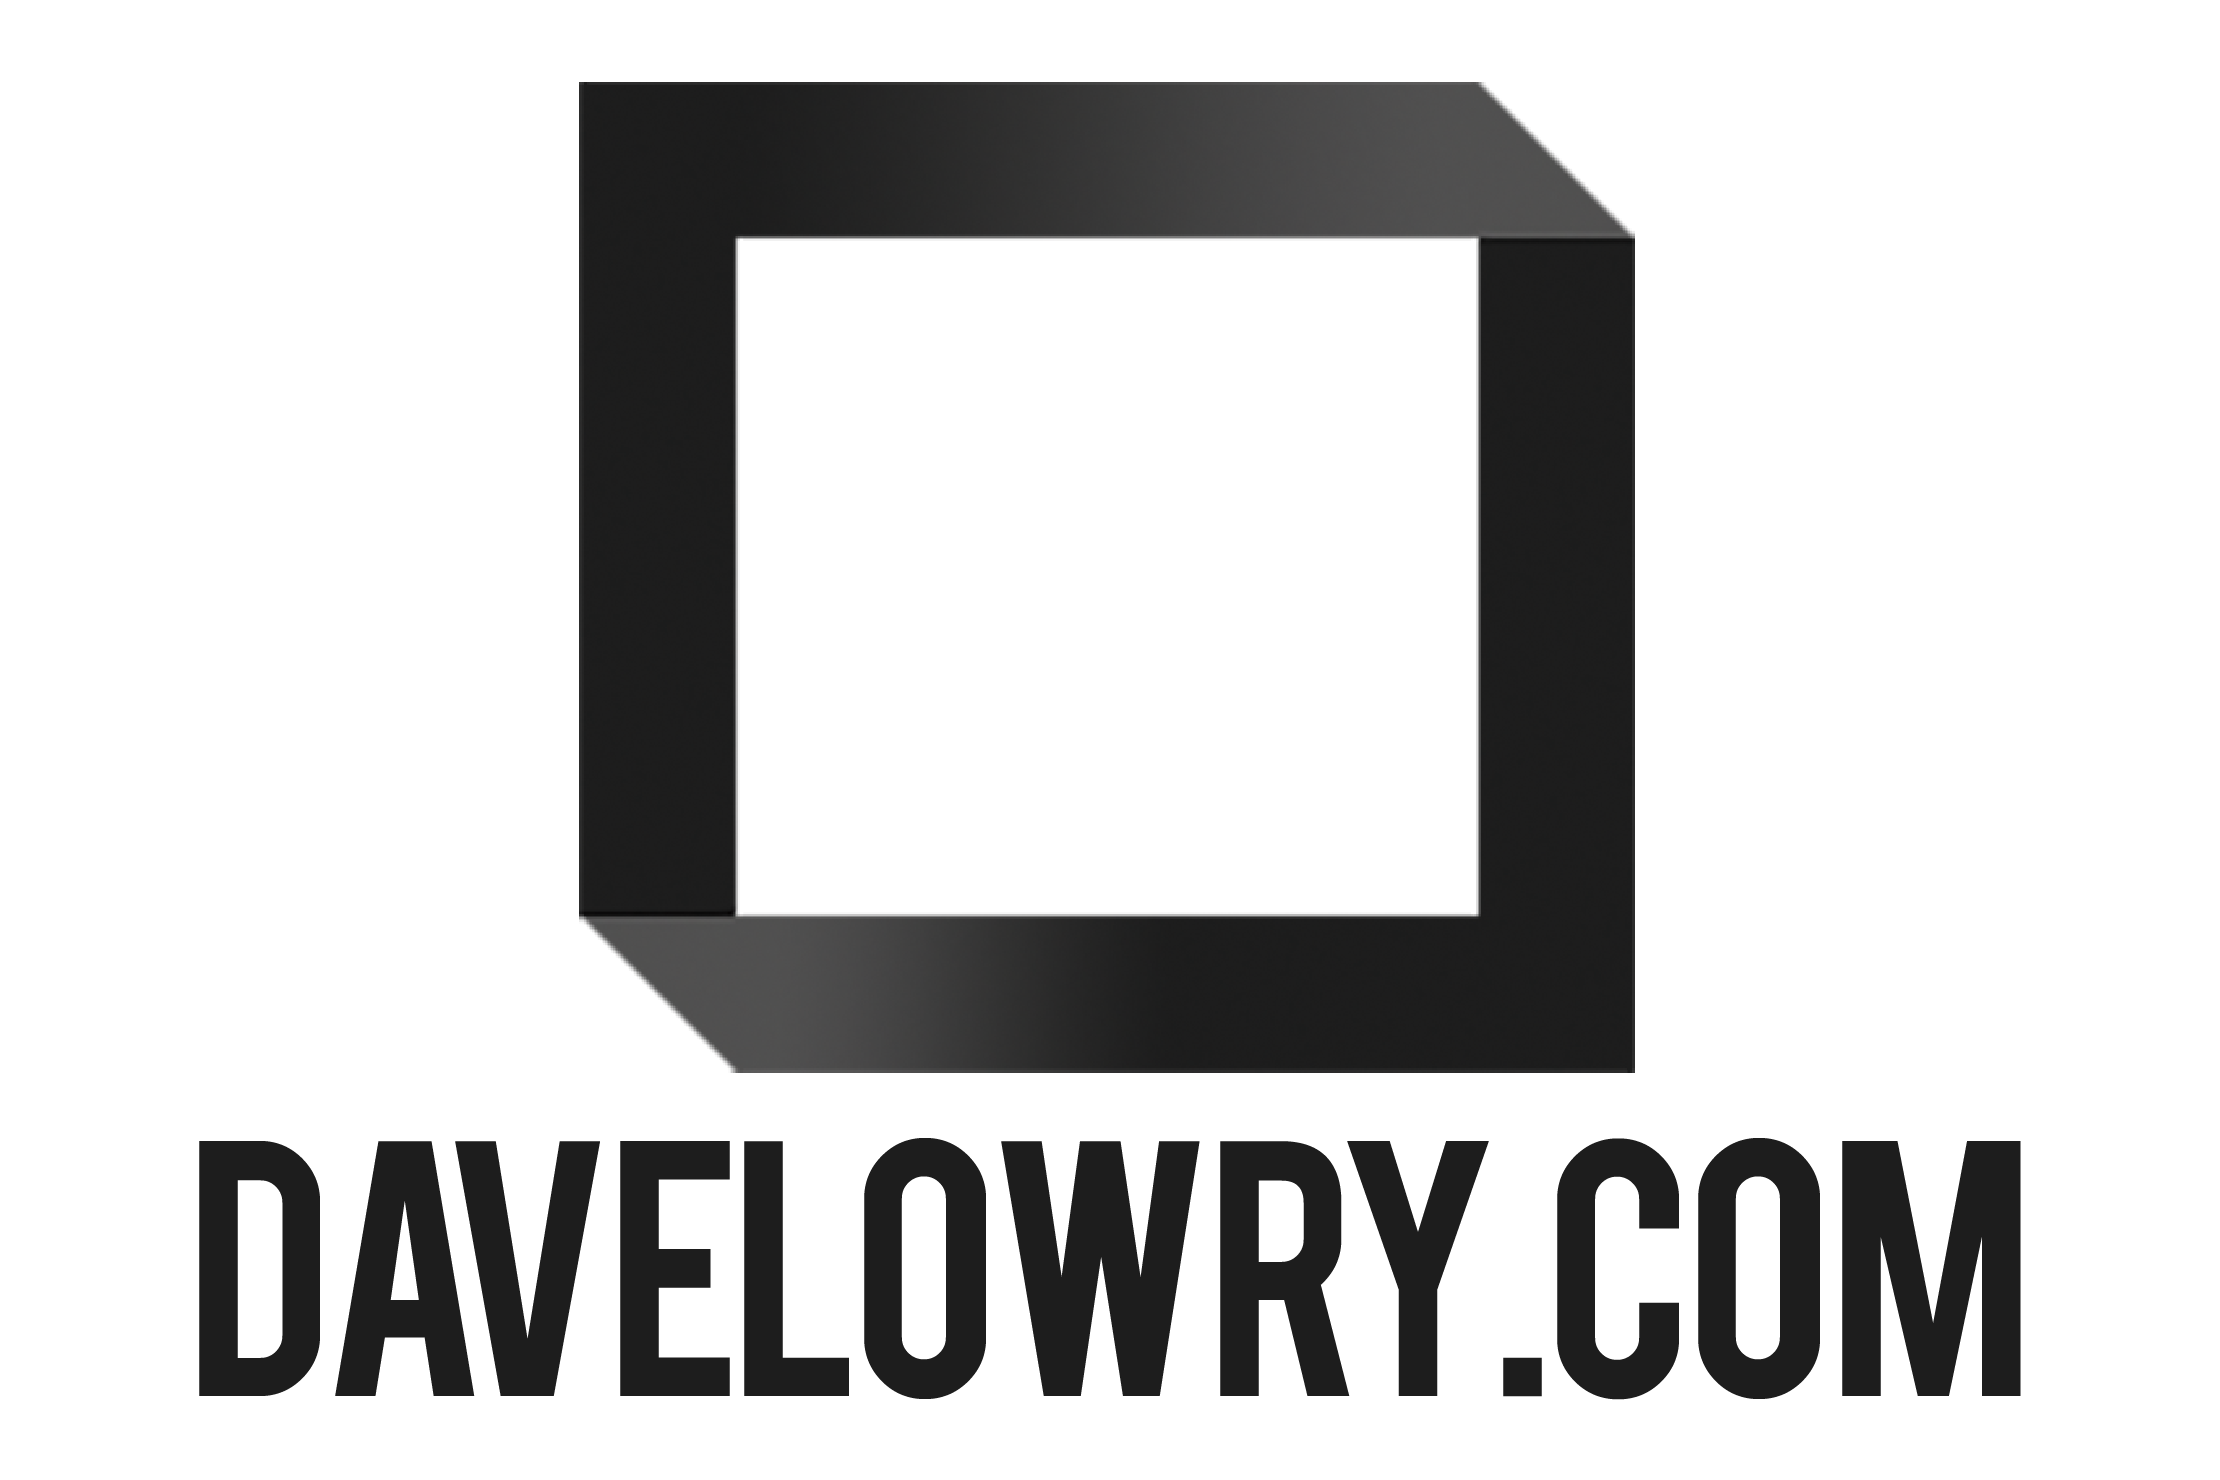 David Lowry